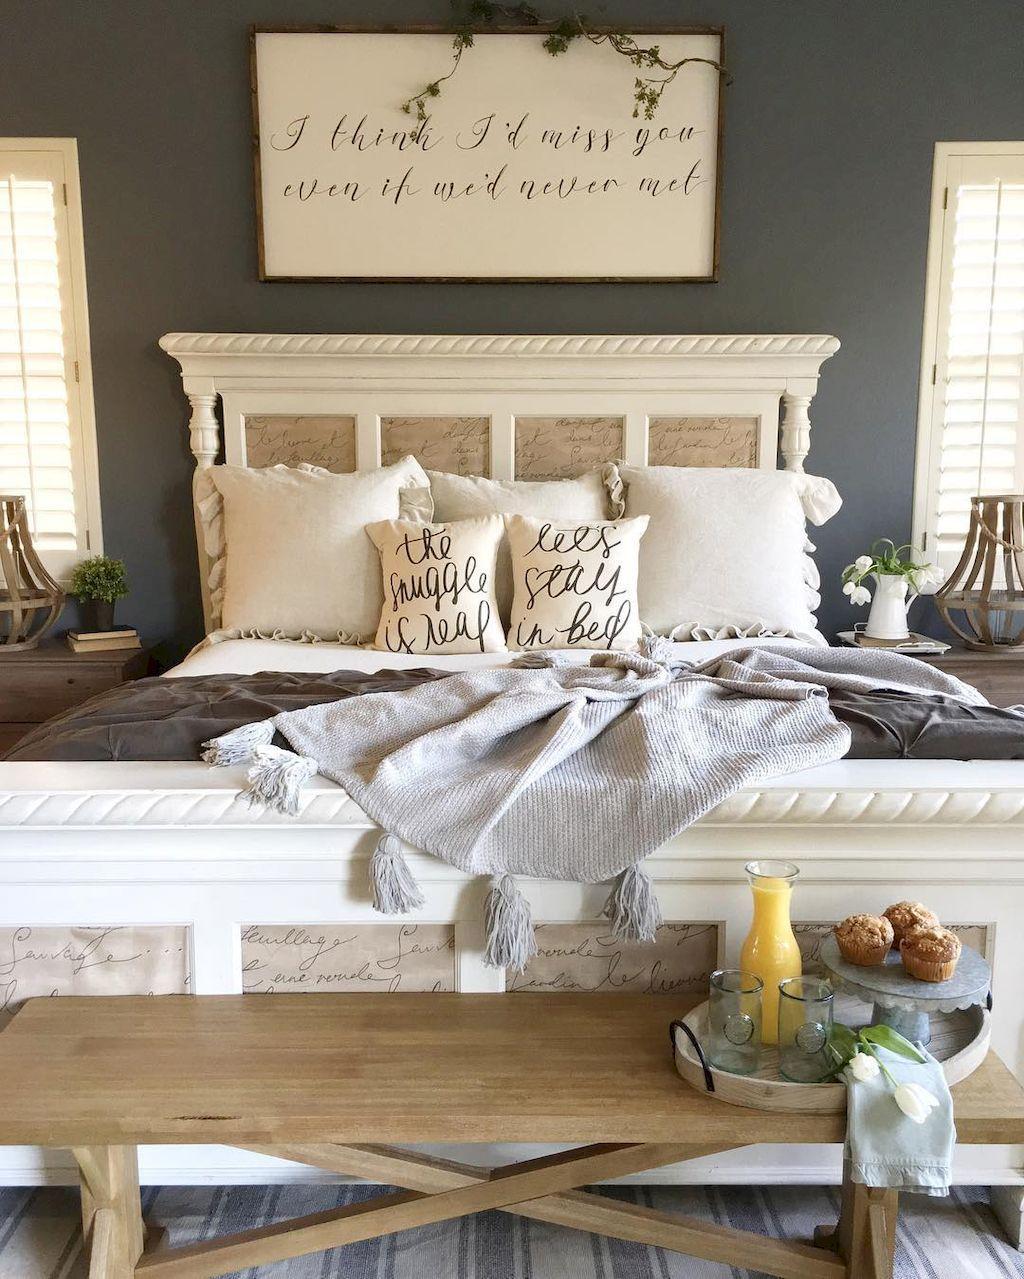 Cozy Farmhouse Bedroom Decorating Ideas 28 Farmhouse Style Master Bedroom Farmhouse Bedroom Decor Home Decor Bedroom